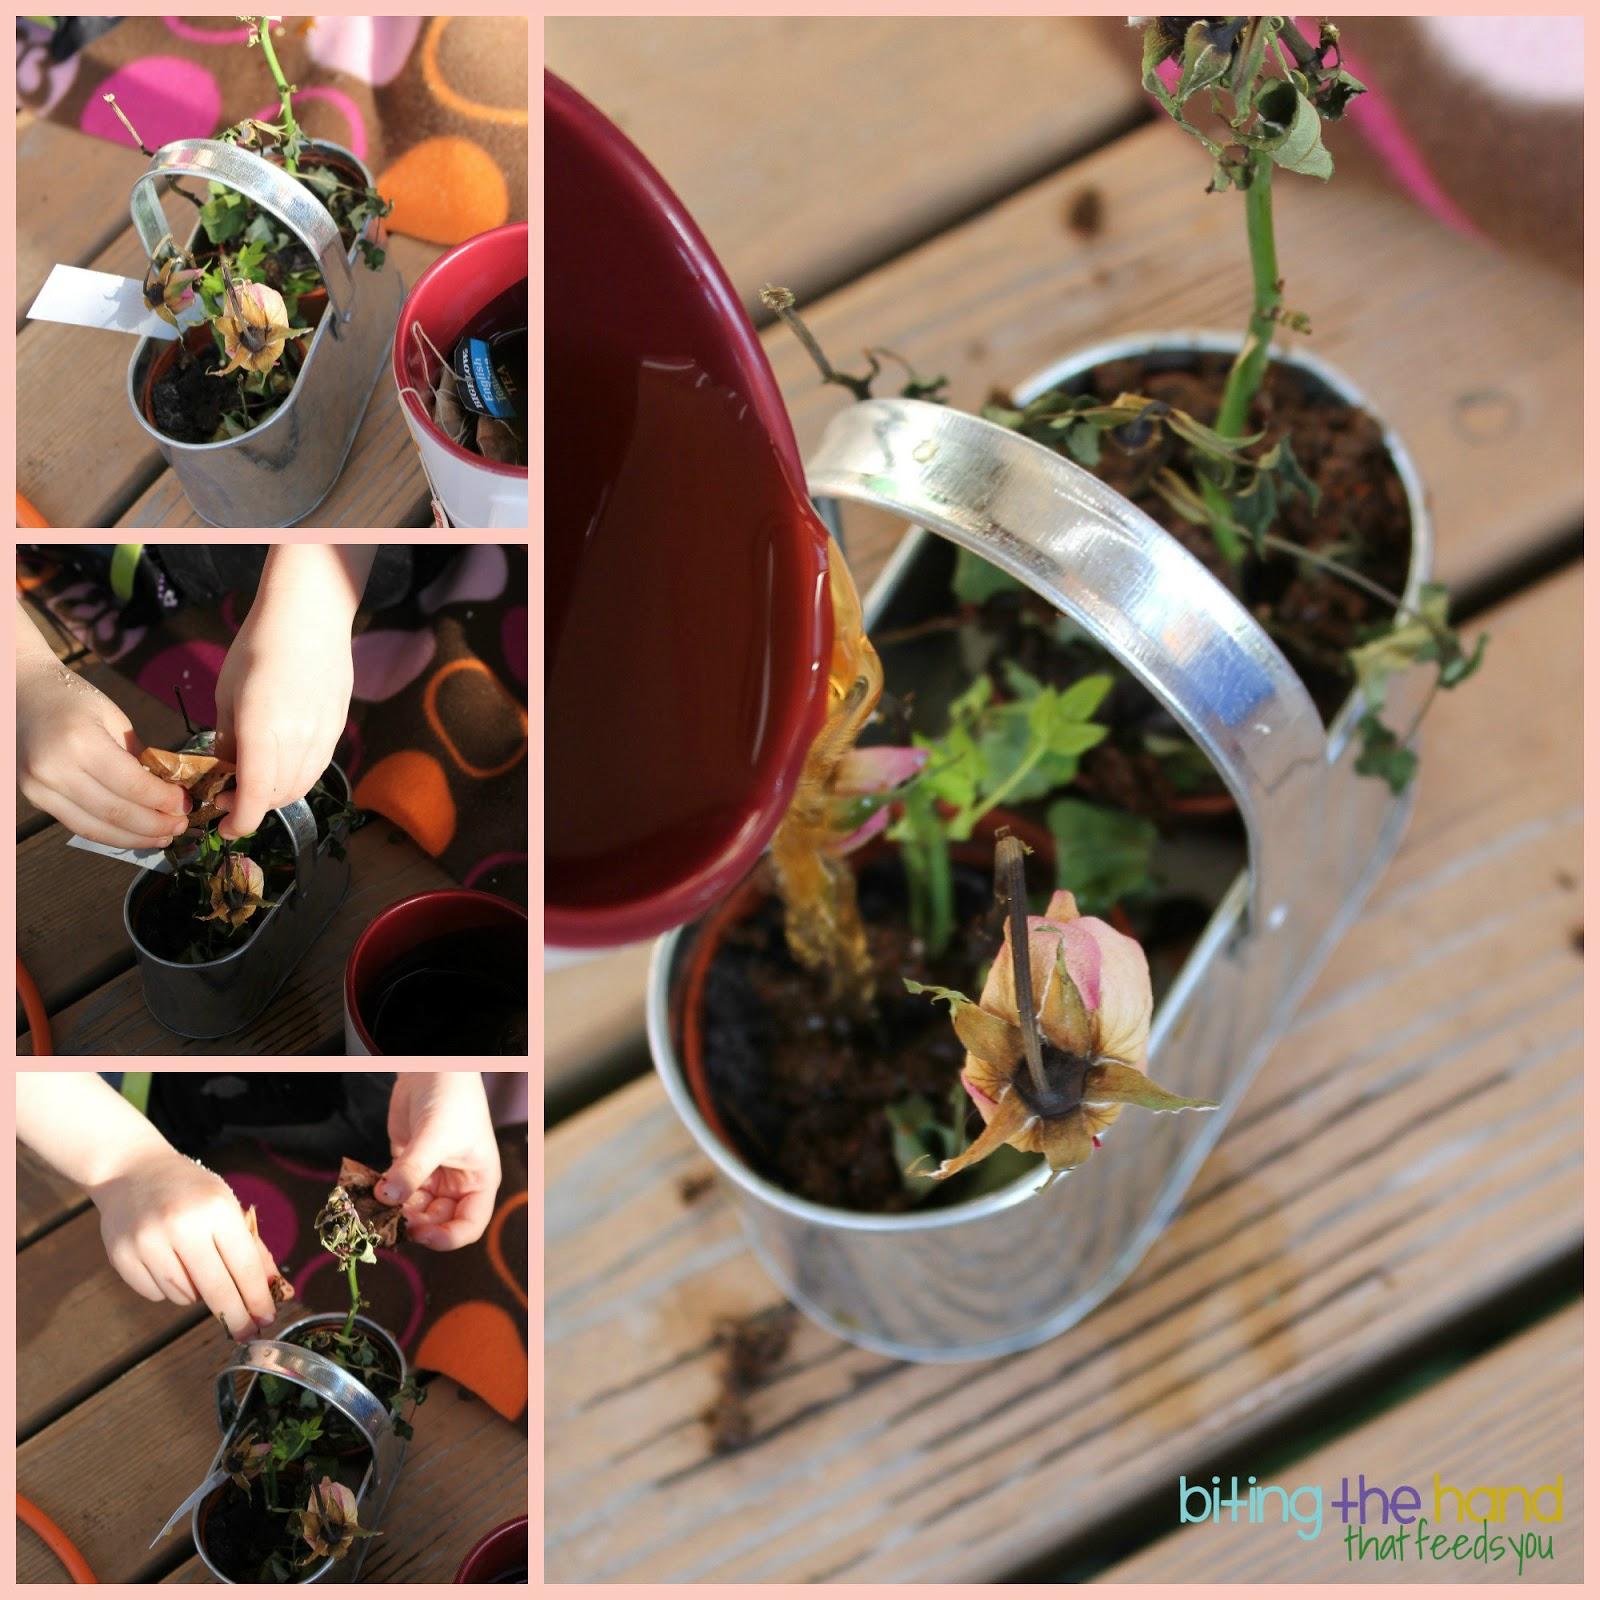 Biting The Hand That Feeds You Earth Day Garden Par Tea